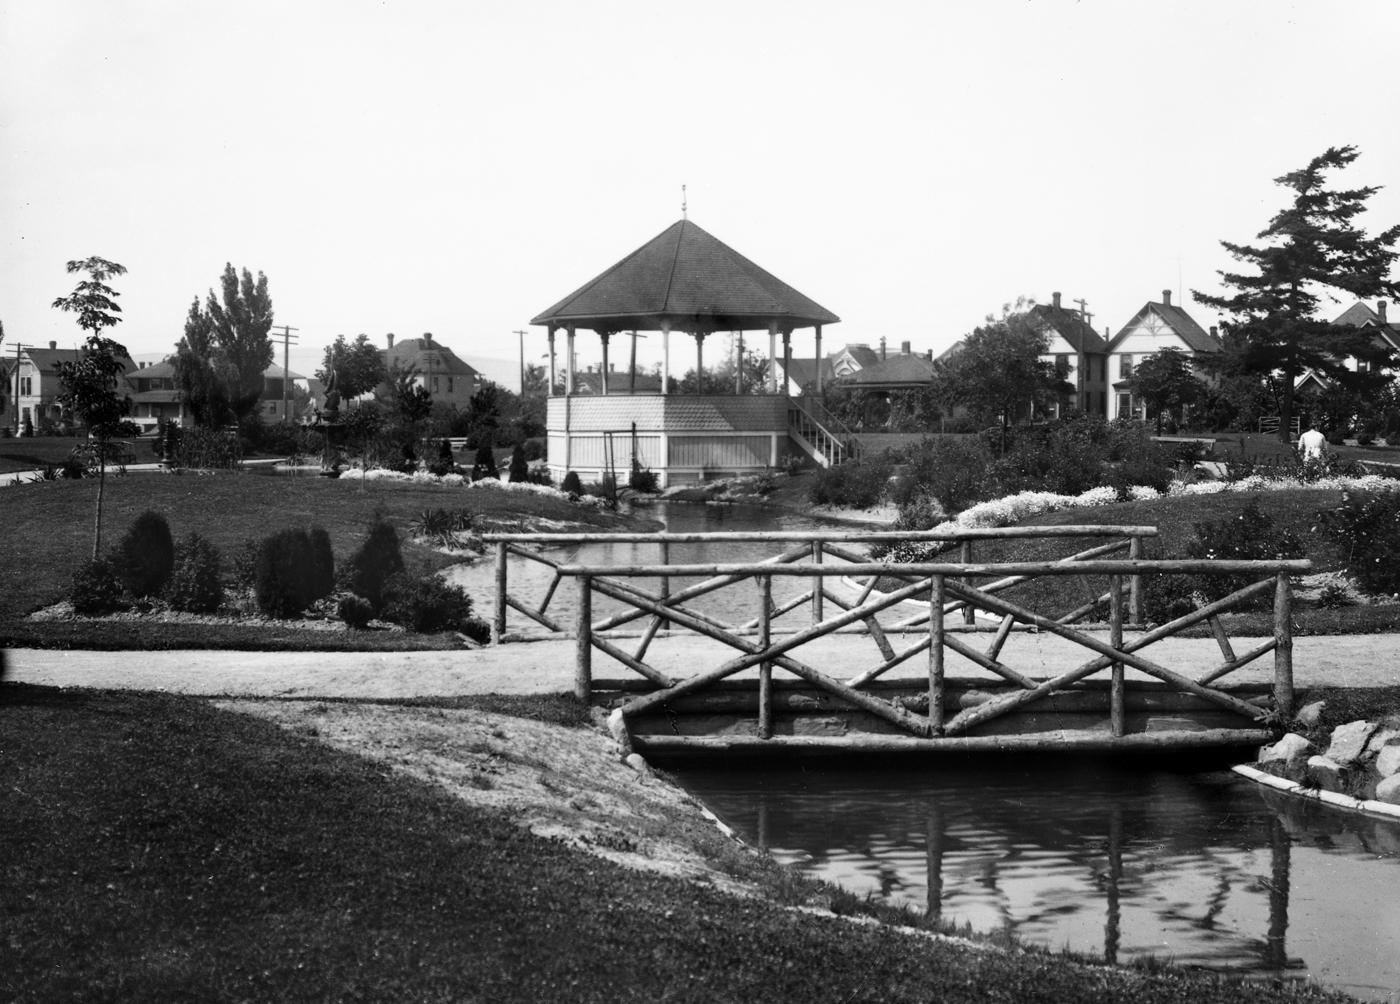 Elizabeth Park, circa 1920s. photo: J.W. Sandison, Whatcom Museum #2796